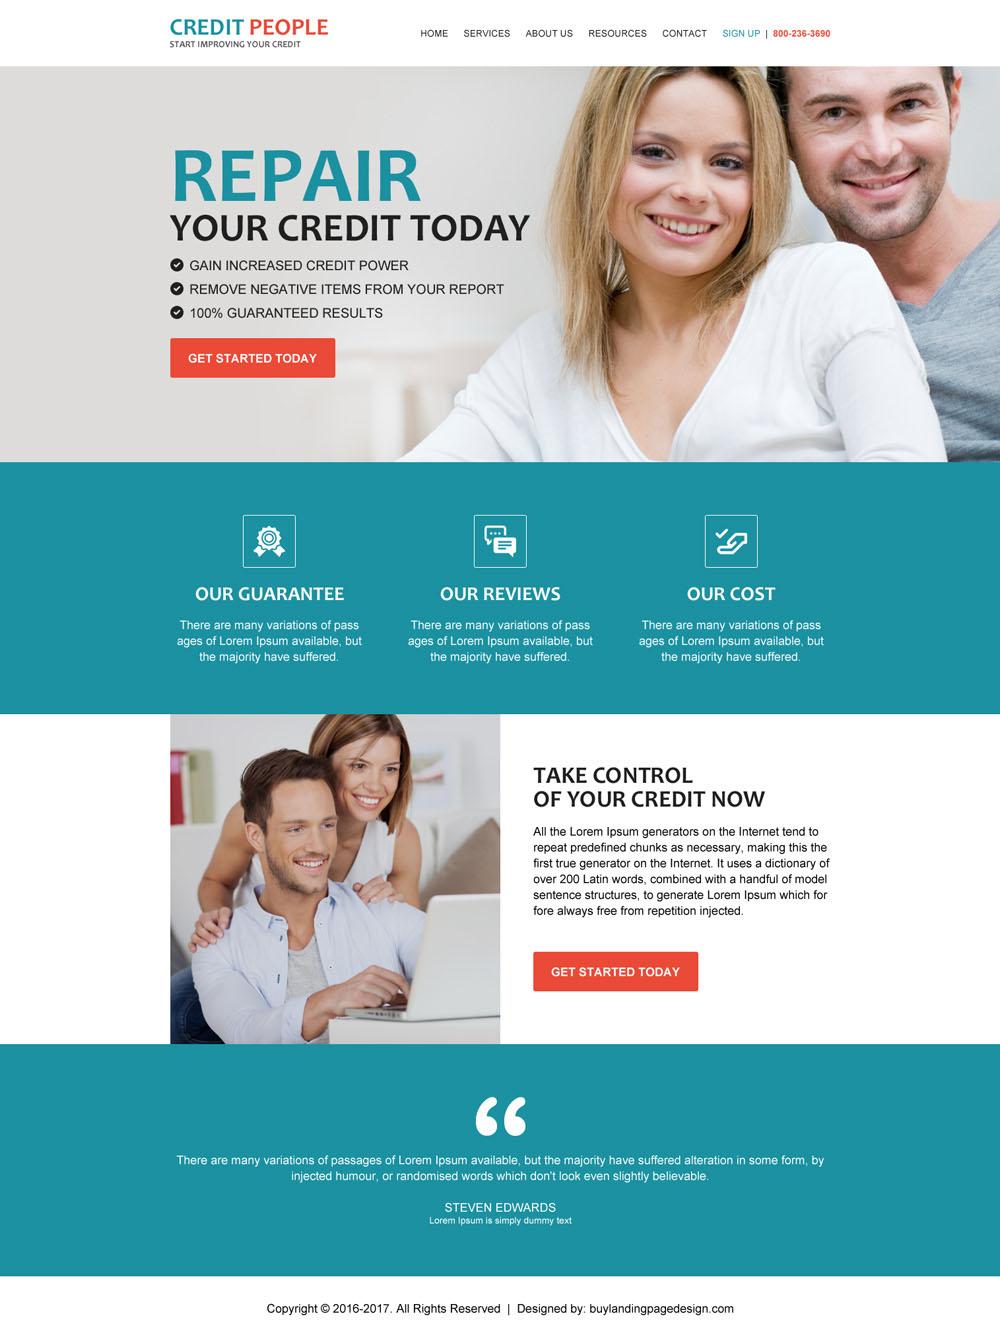 best-credit-repair-companies-html-website-design-templates-002-index